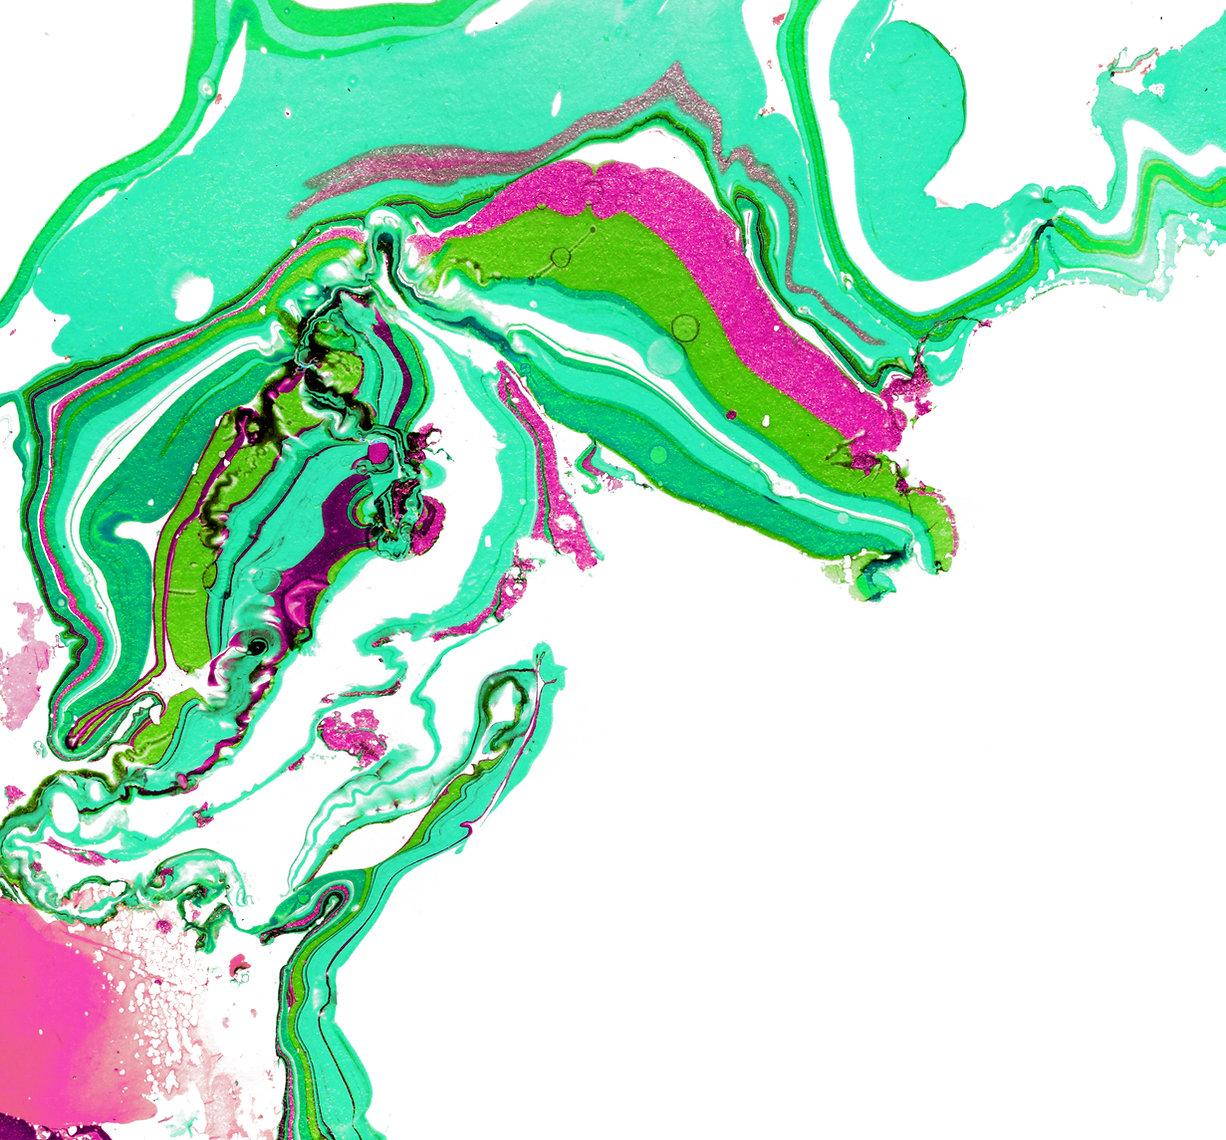 Peinture abstraite vert